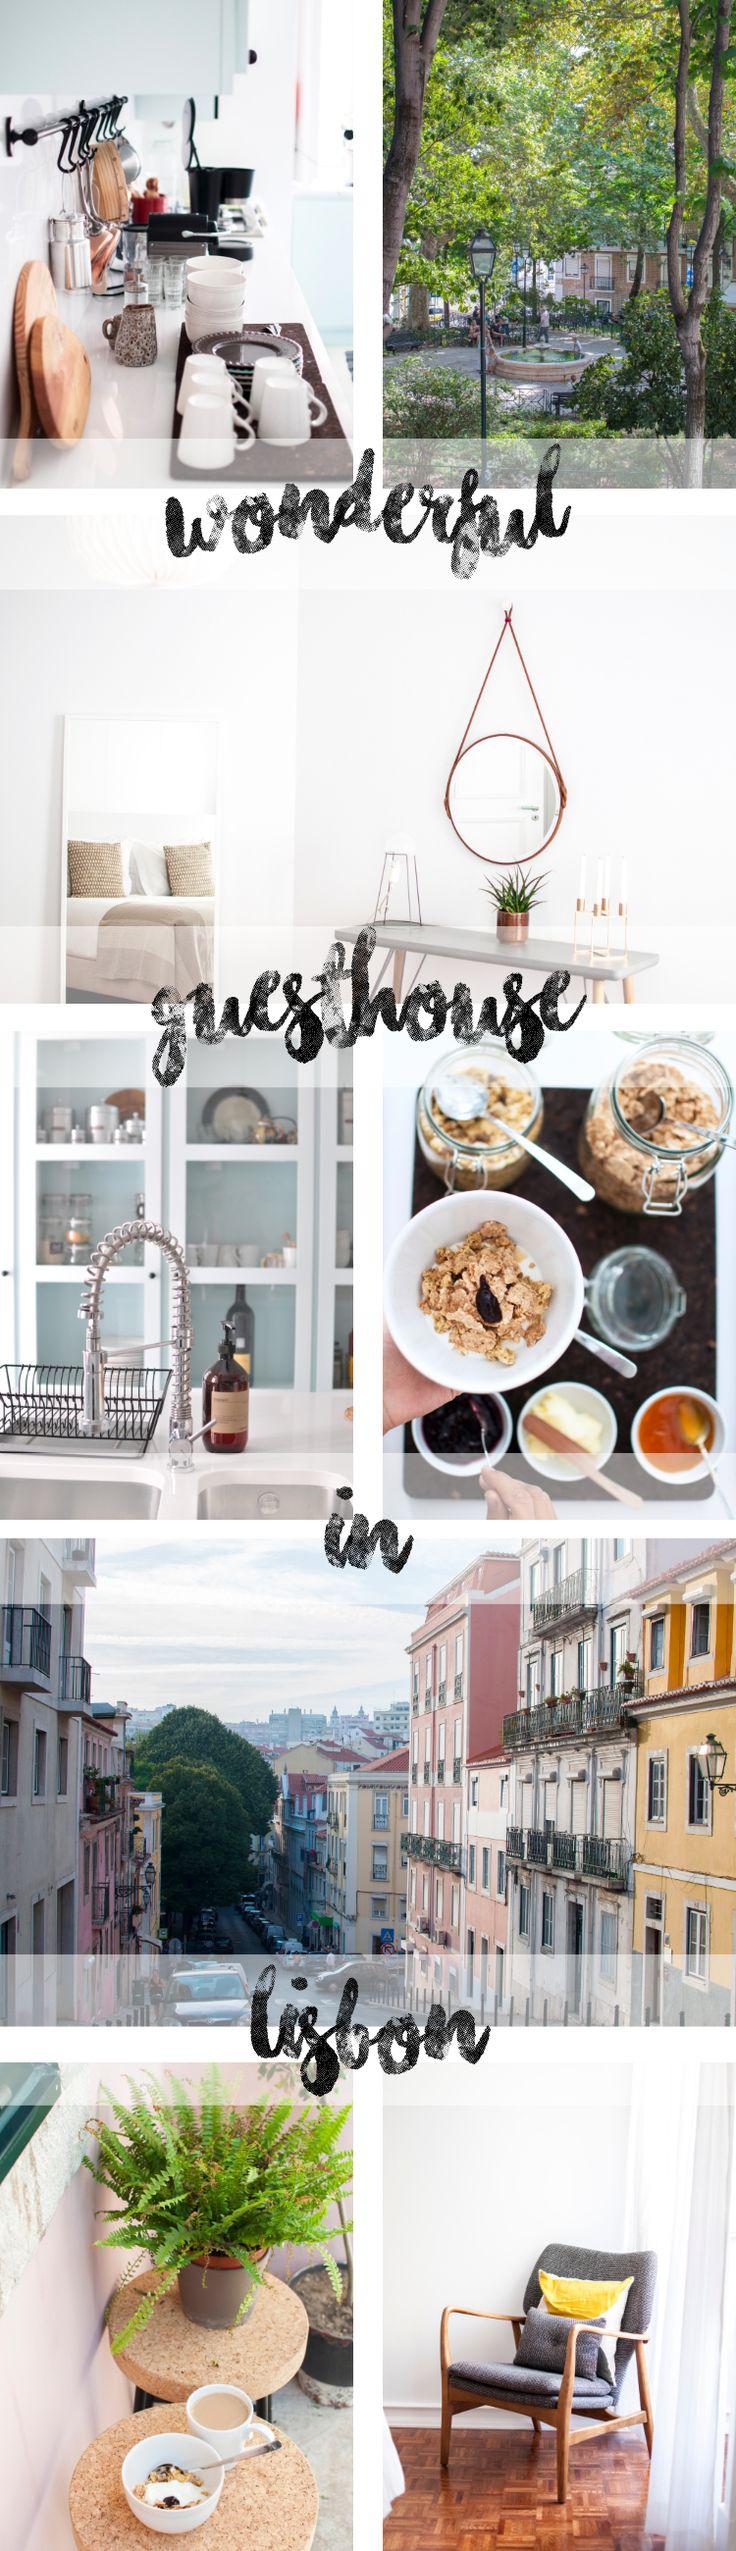 Großartige Tipps für den nächsten Lissabon-Ausflug. #wohnen idee #lissabon #portugal   >>Lisbon Hipster & Coffee Guide - our beautiful Guesthouse the Casa C'Alma near Praça das Flores